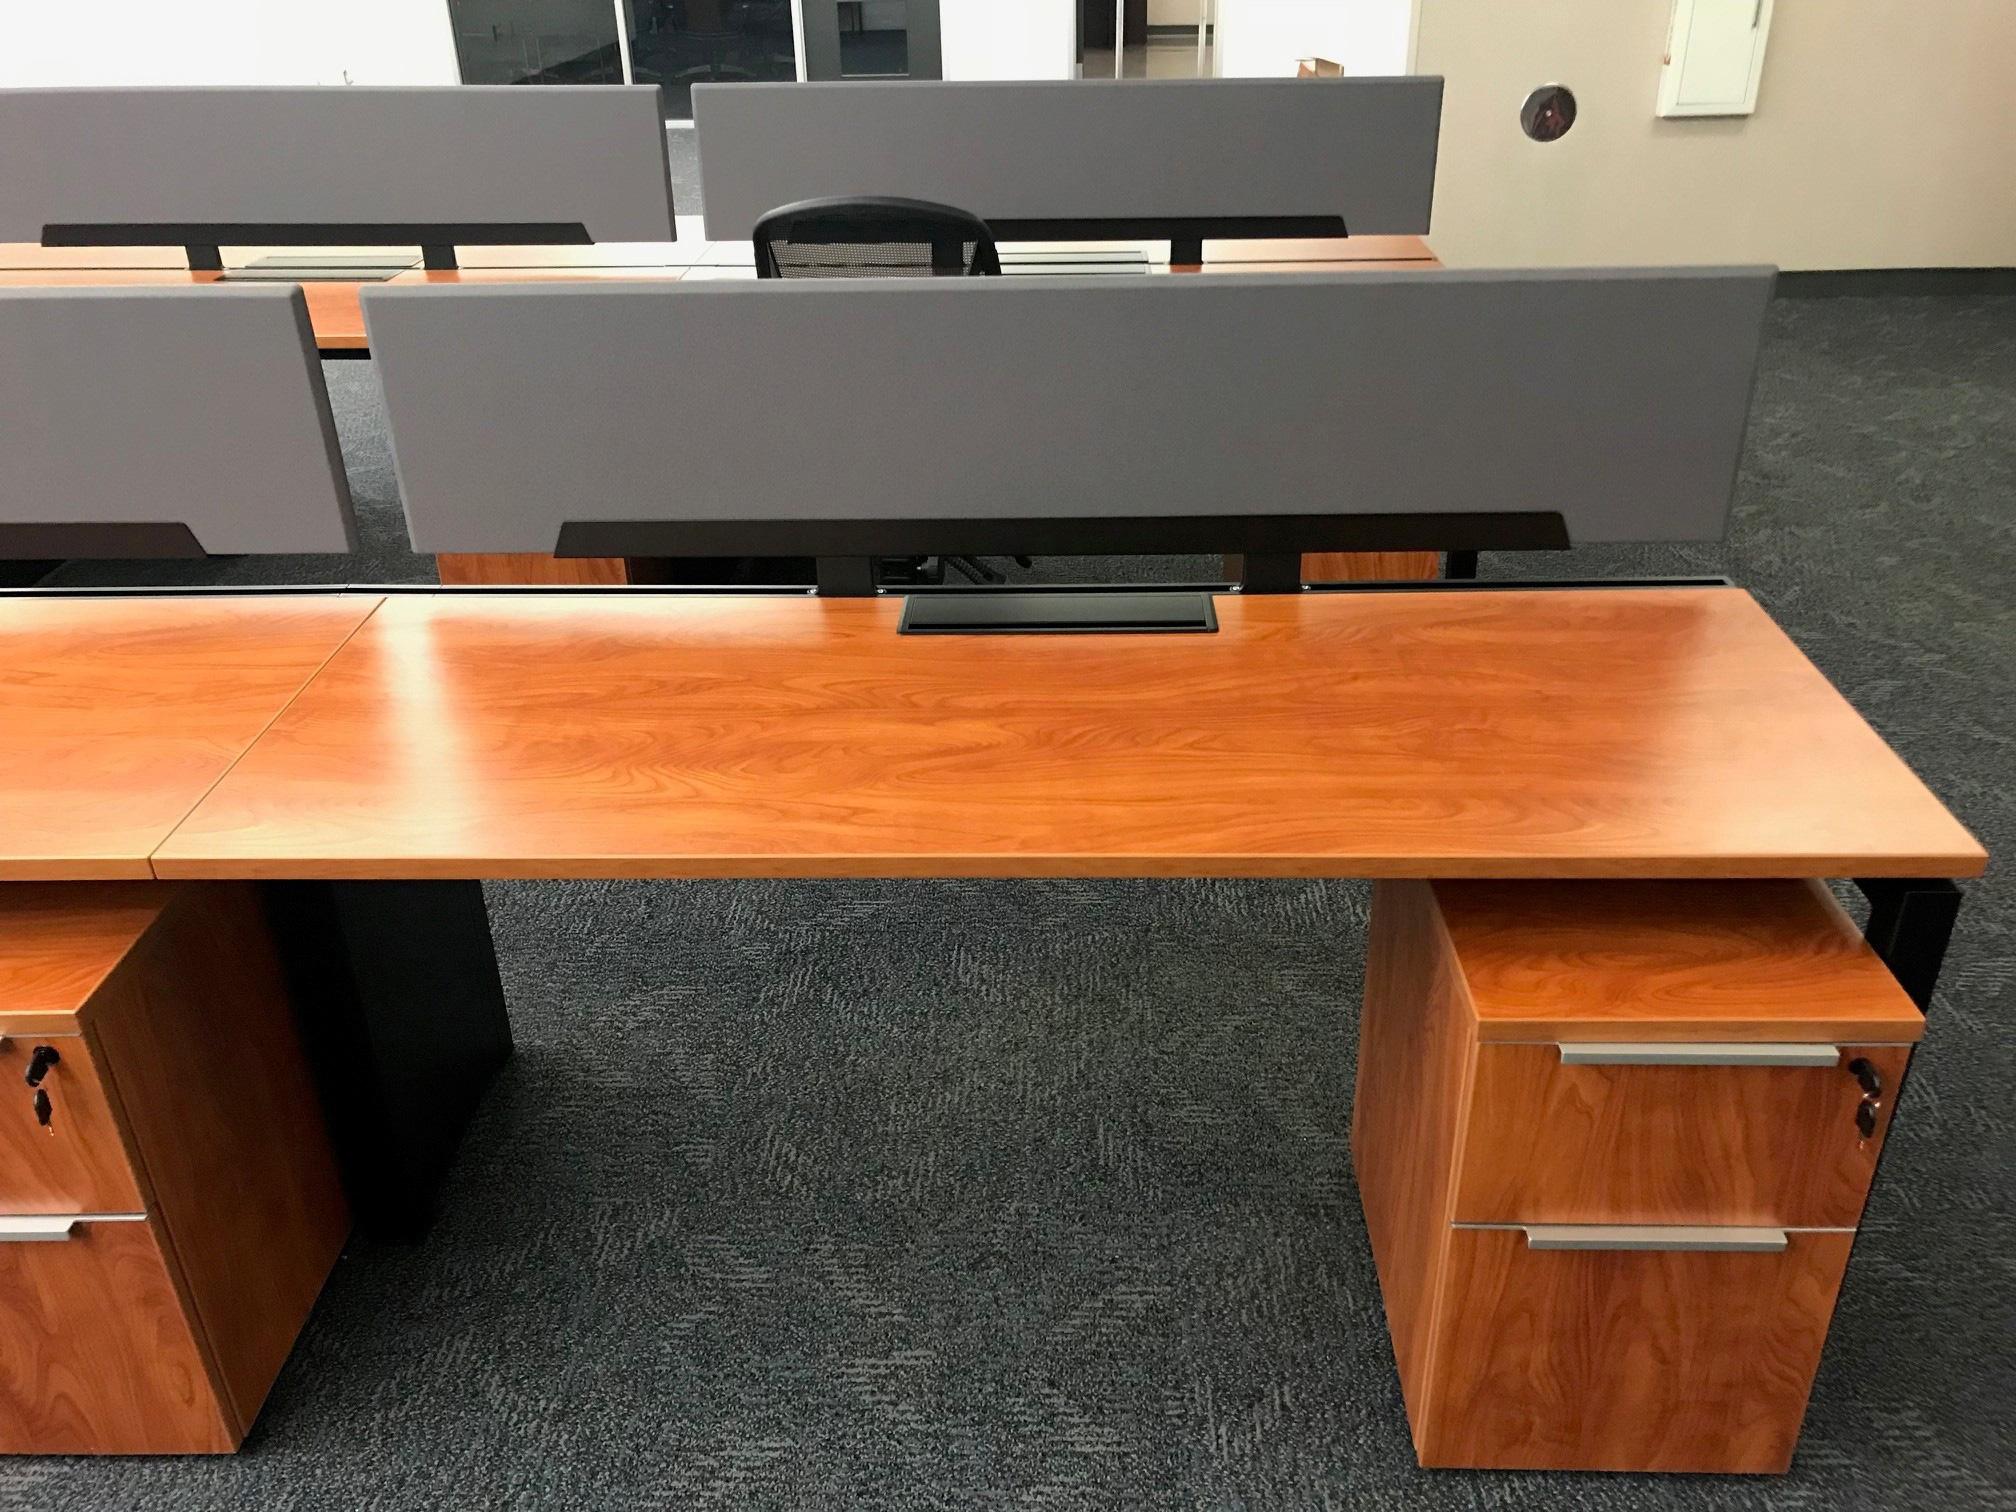 manasota-office-supplies-llc-4.jpg